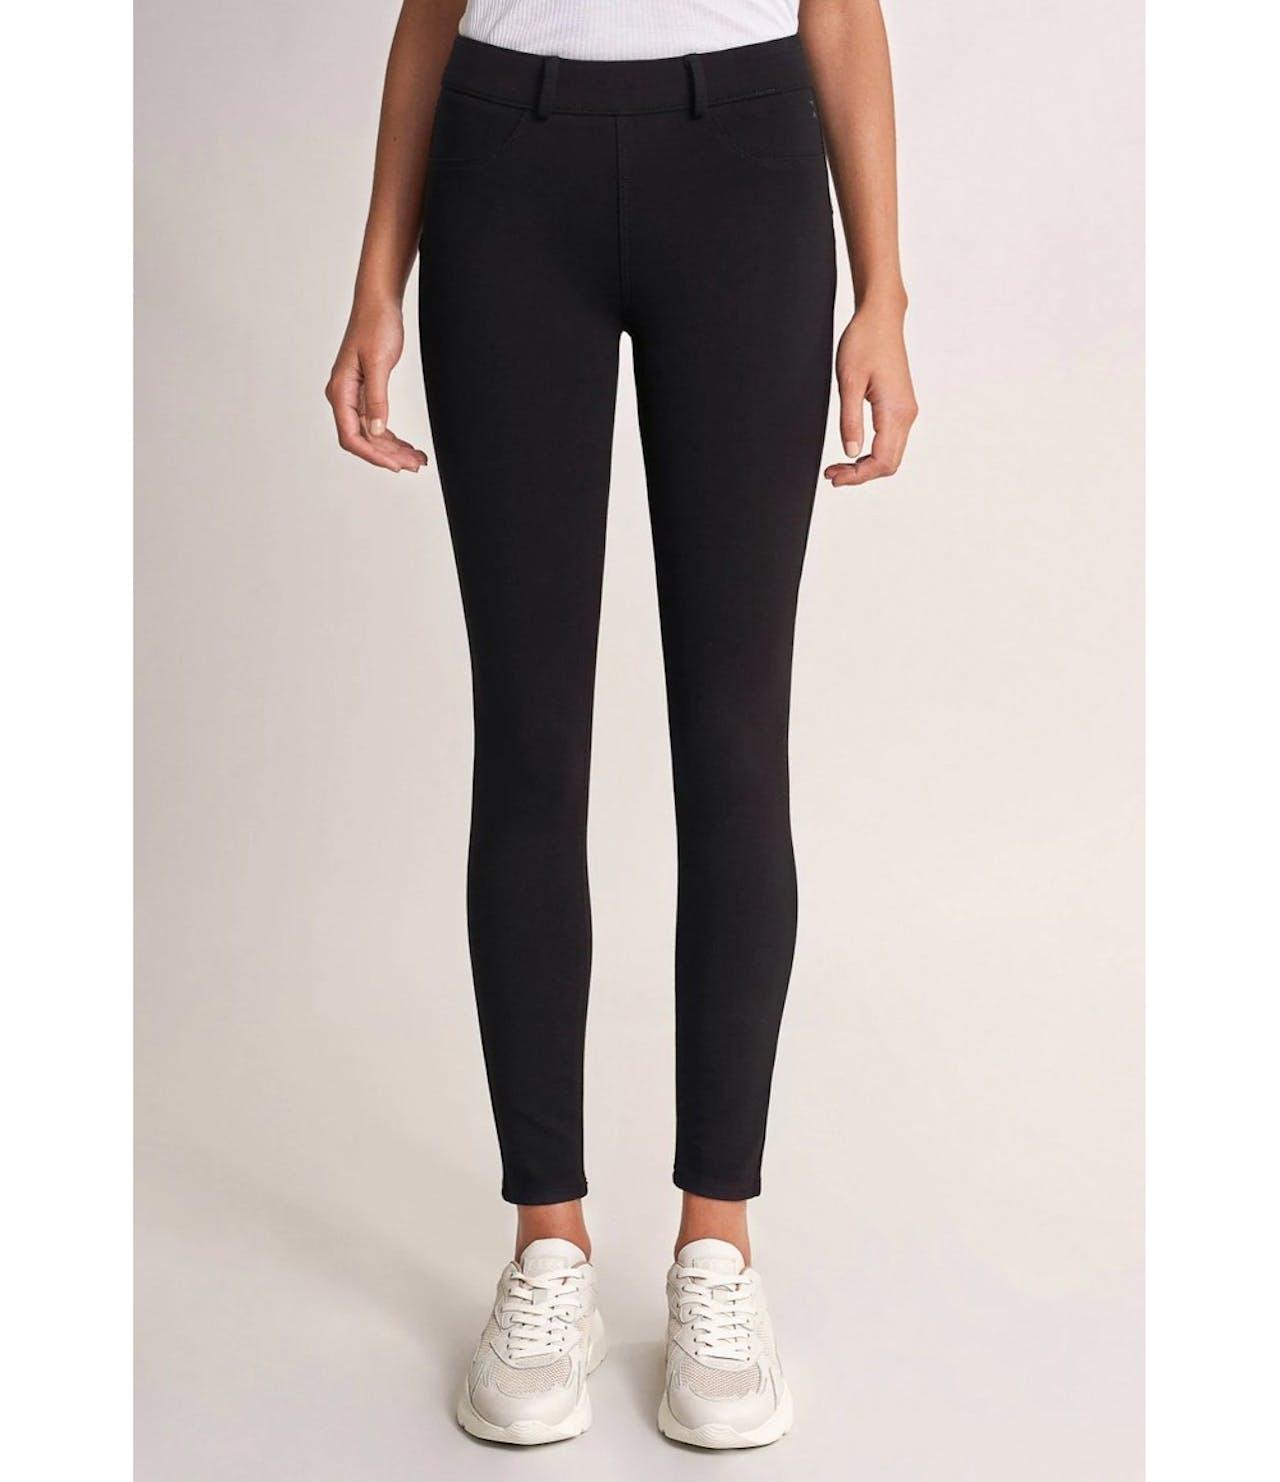 Salsa Jeans 28 Leg Push Up Wonder High-Waisted Capri Jeggings